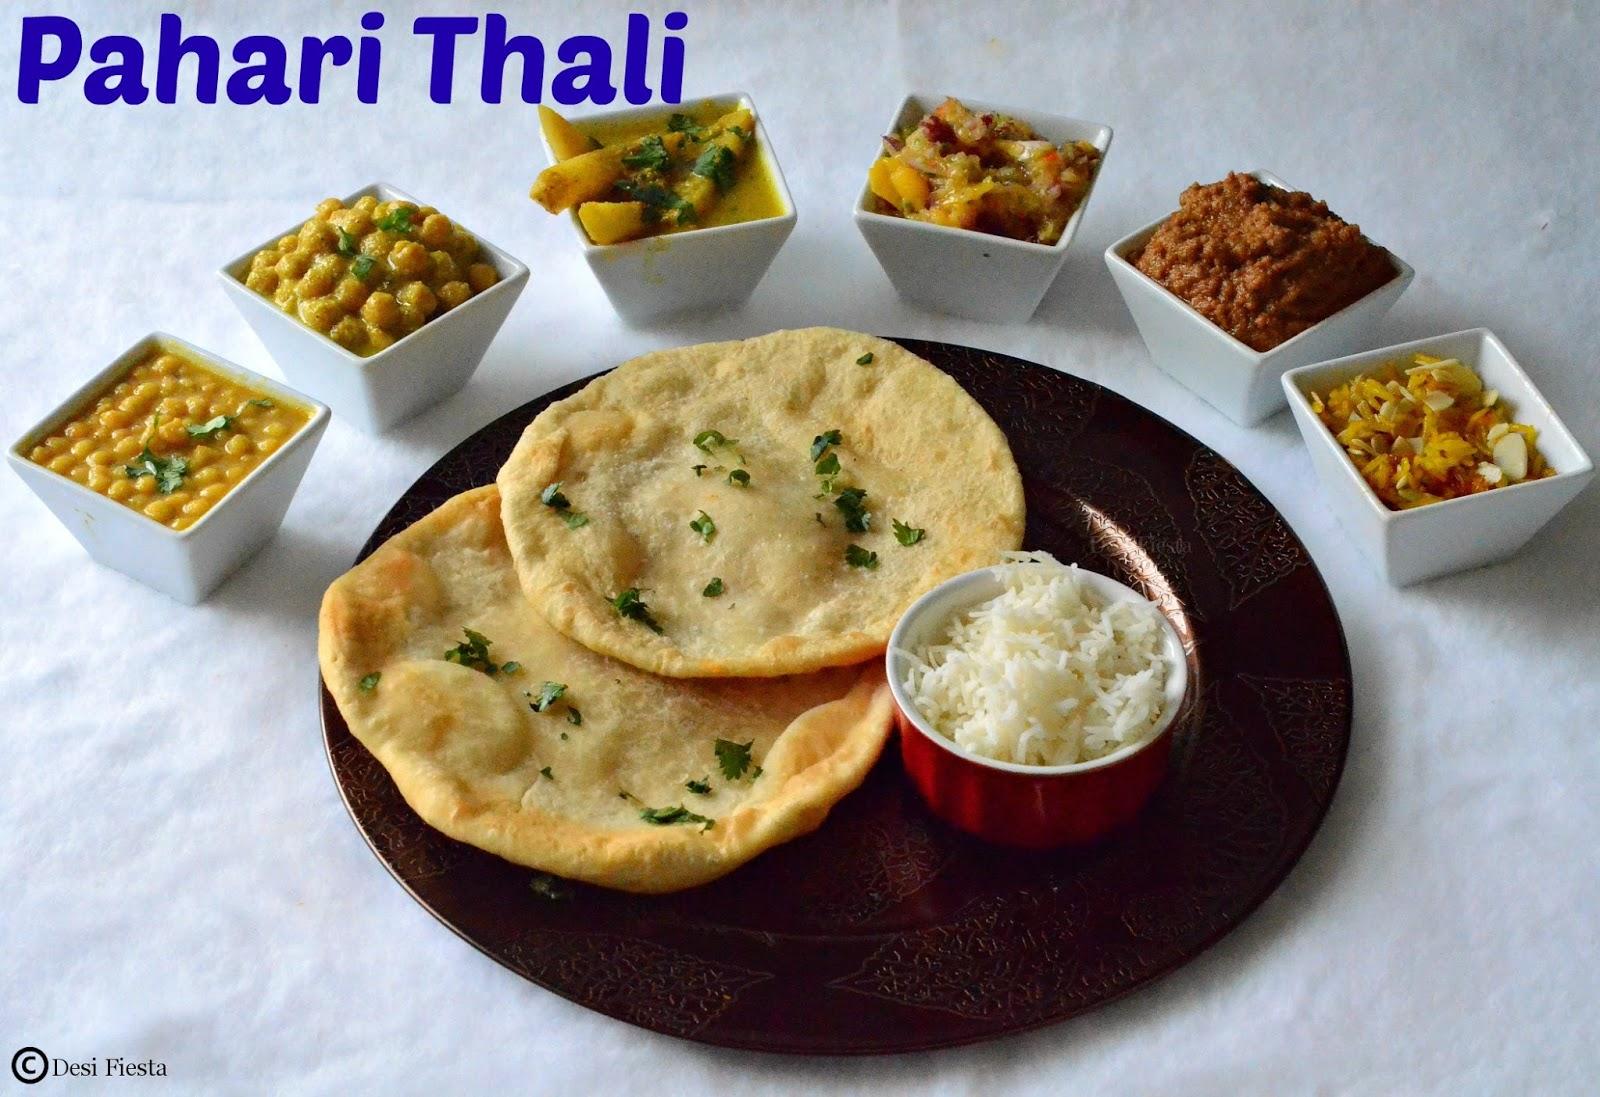 Desi fiesta himachal pradesh thali pahari thali for Arunachal pradesh cuisine